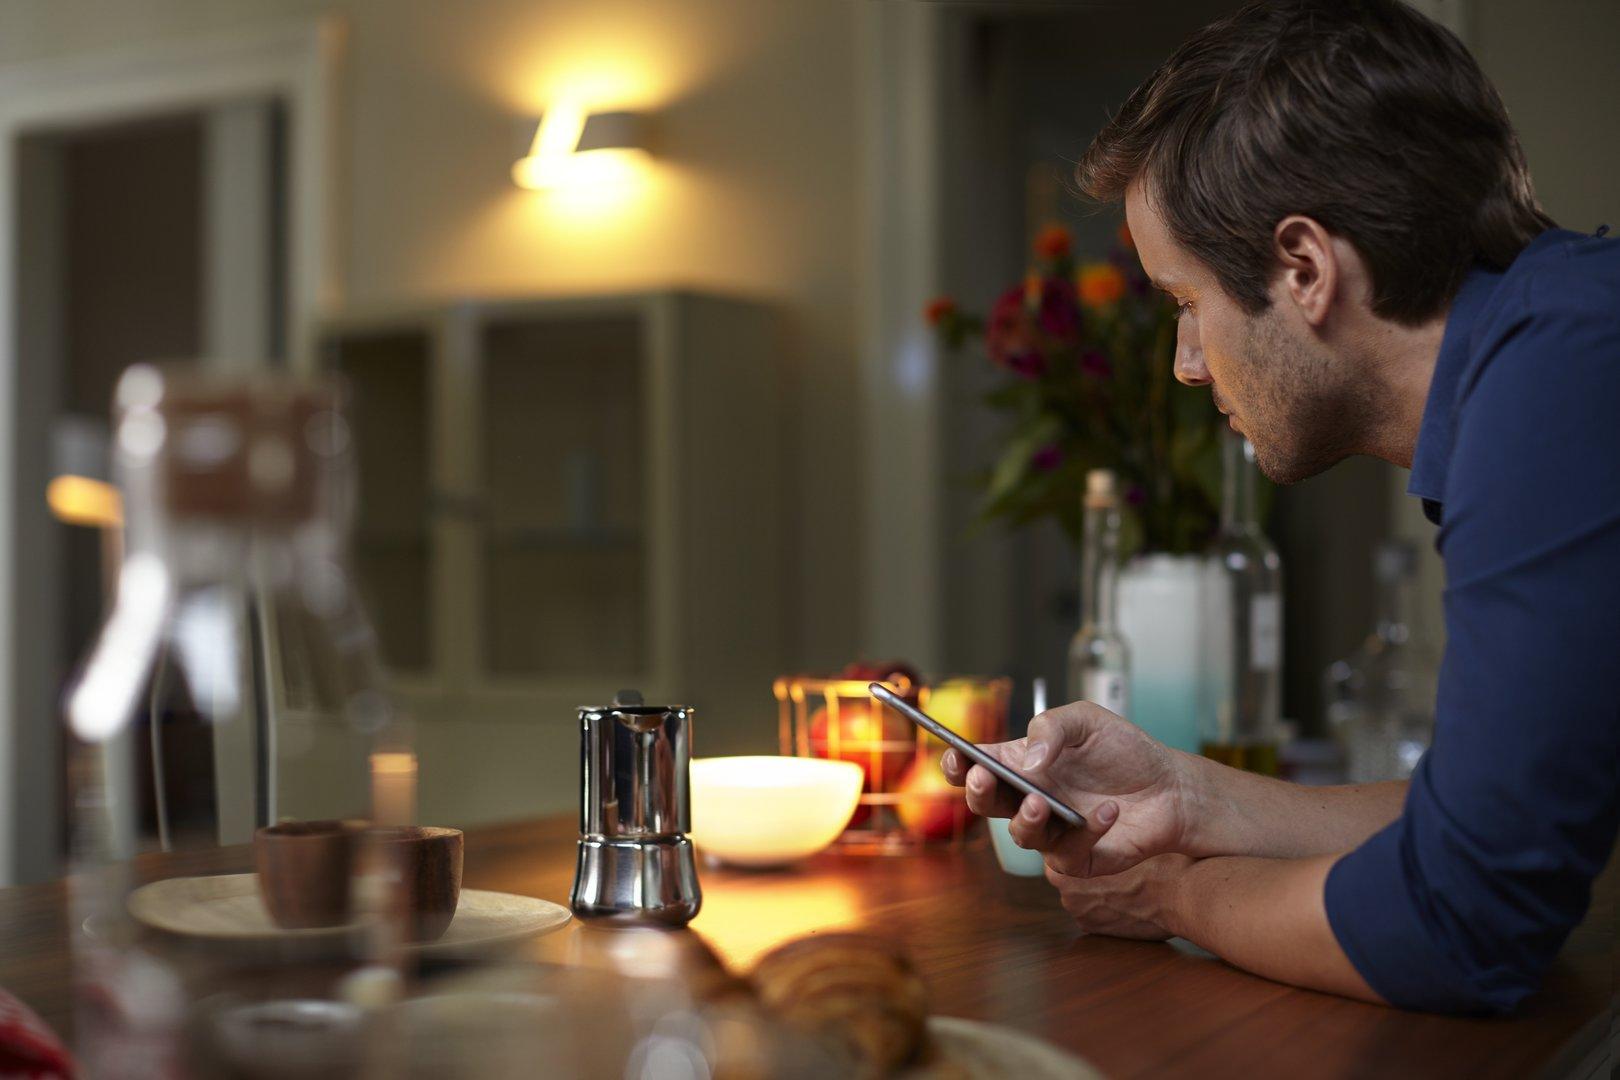 Philips_Hue_otthoni világítás